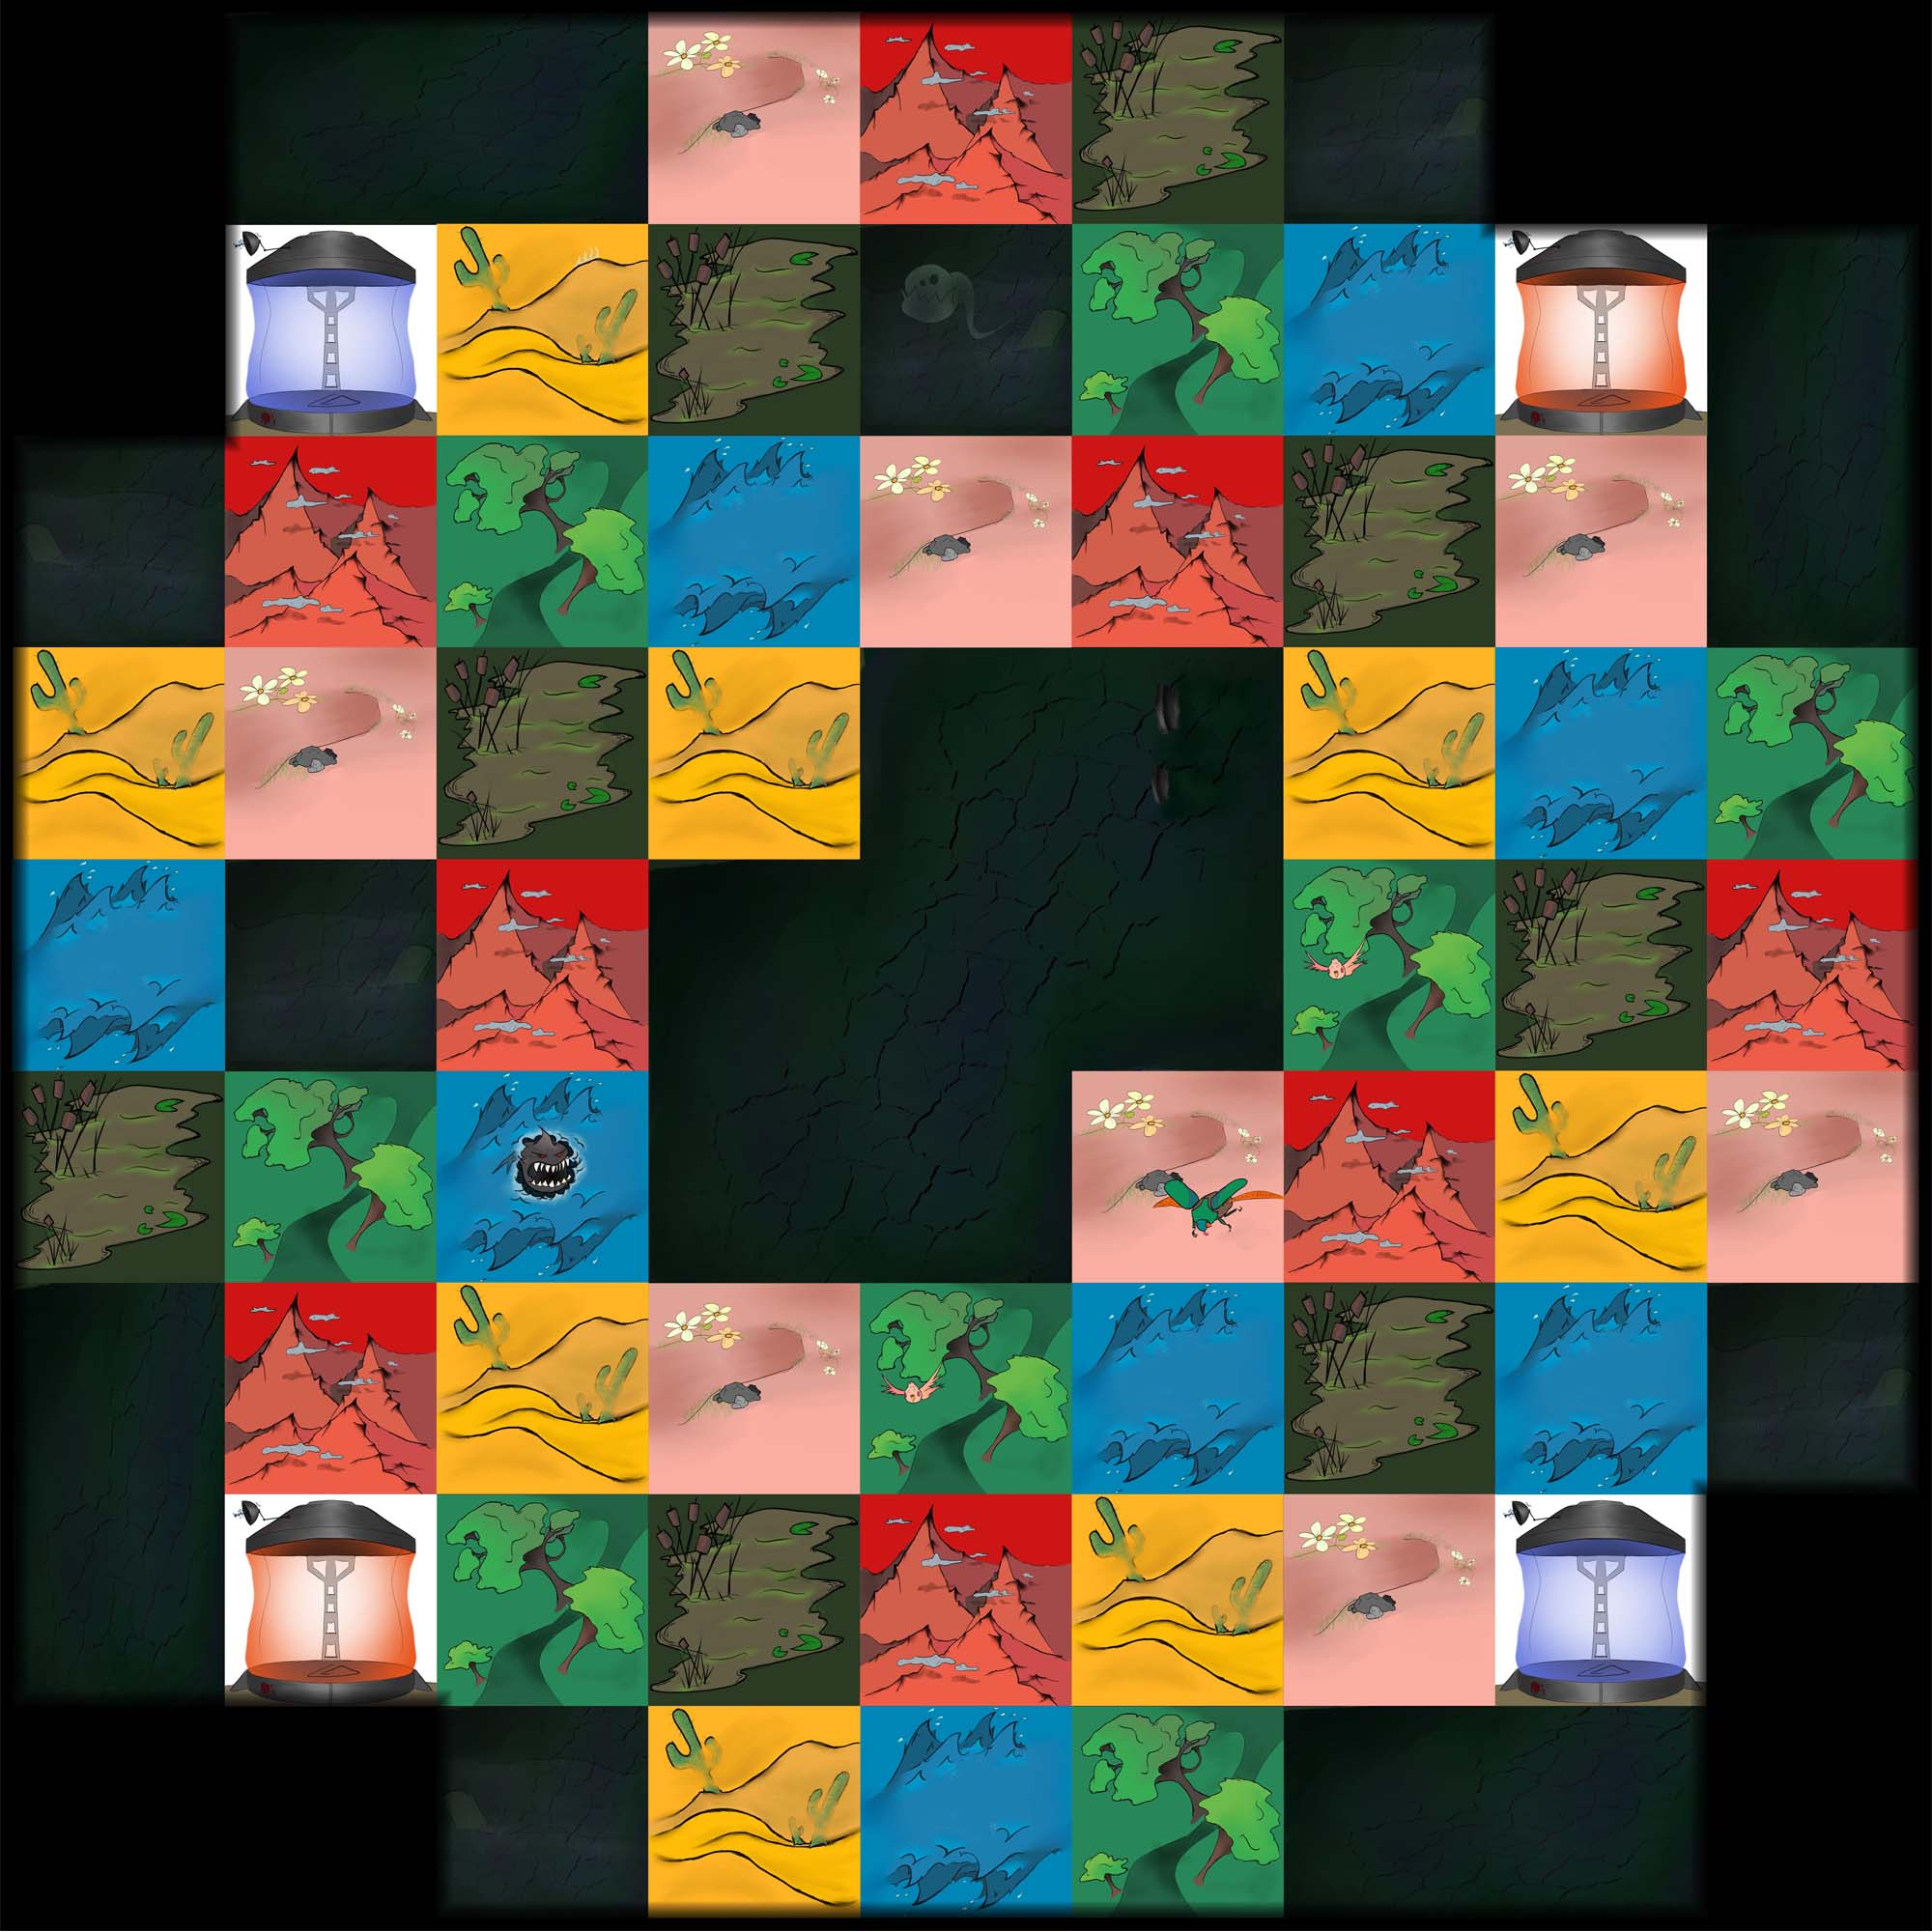 Fantasy Turf Wars board game